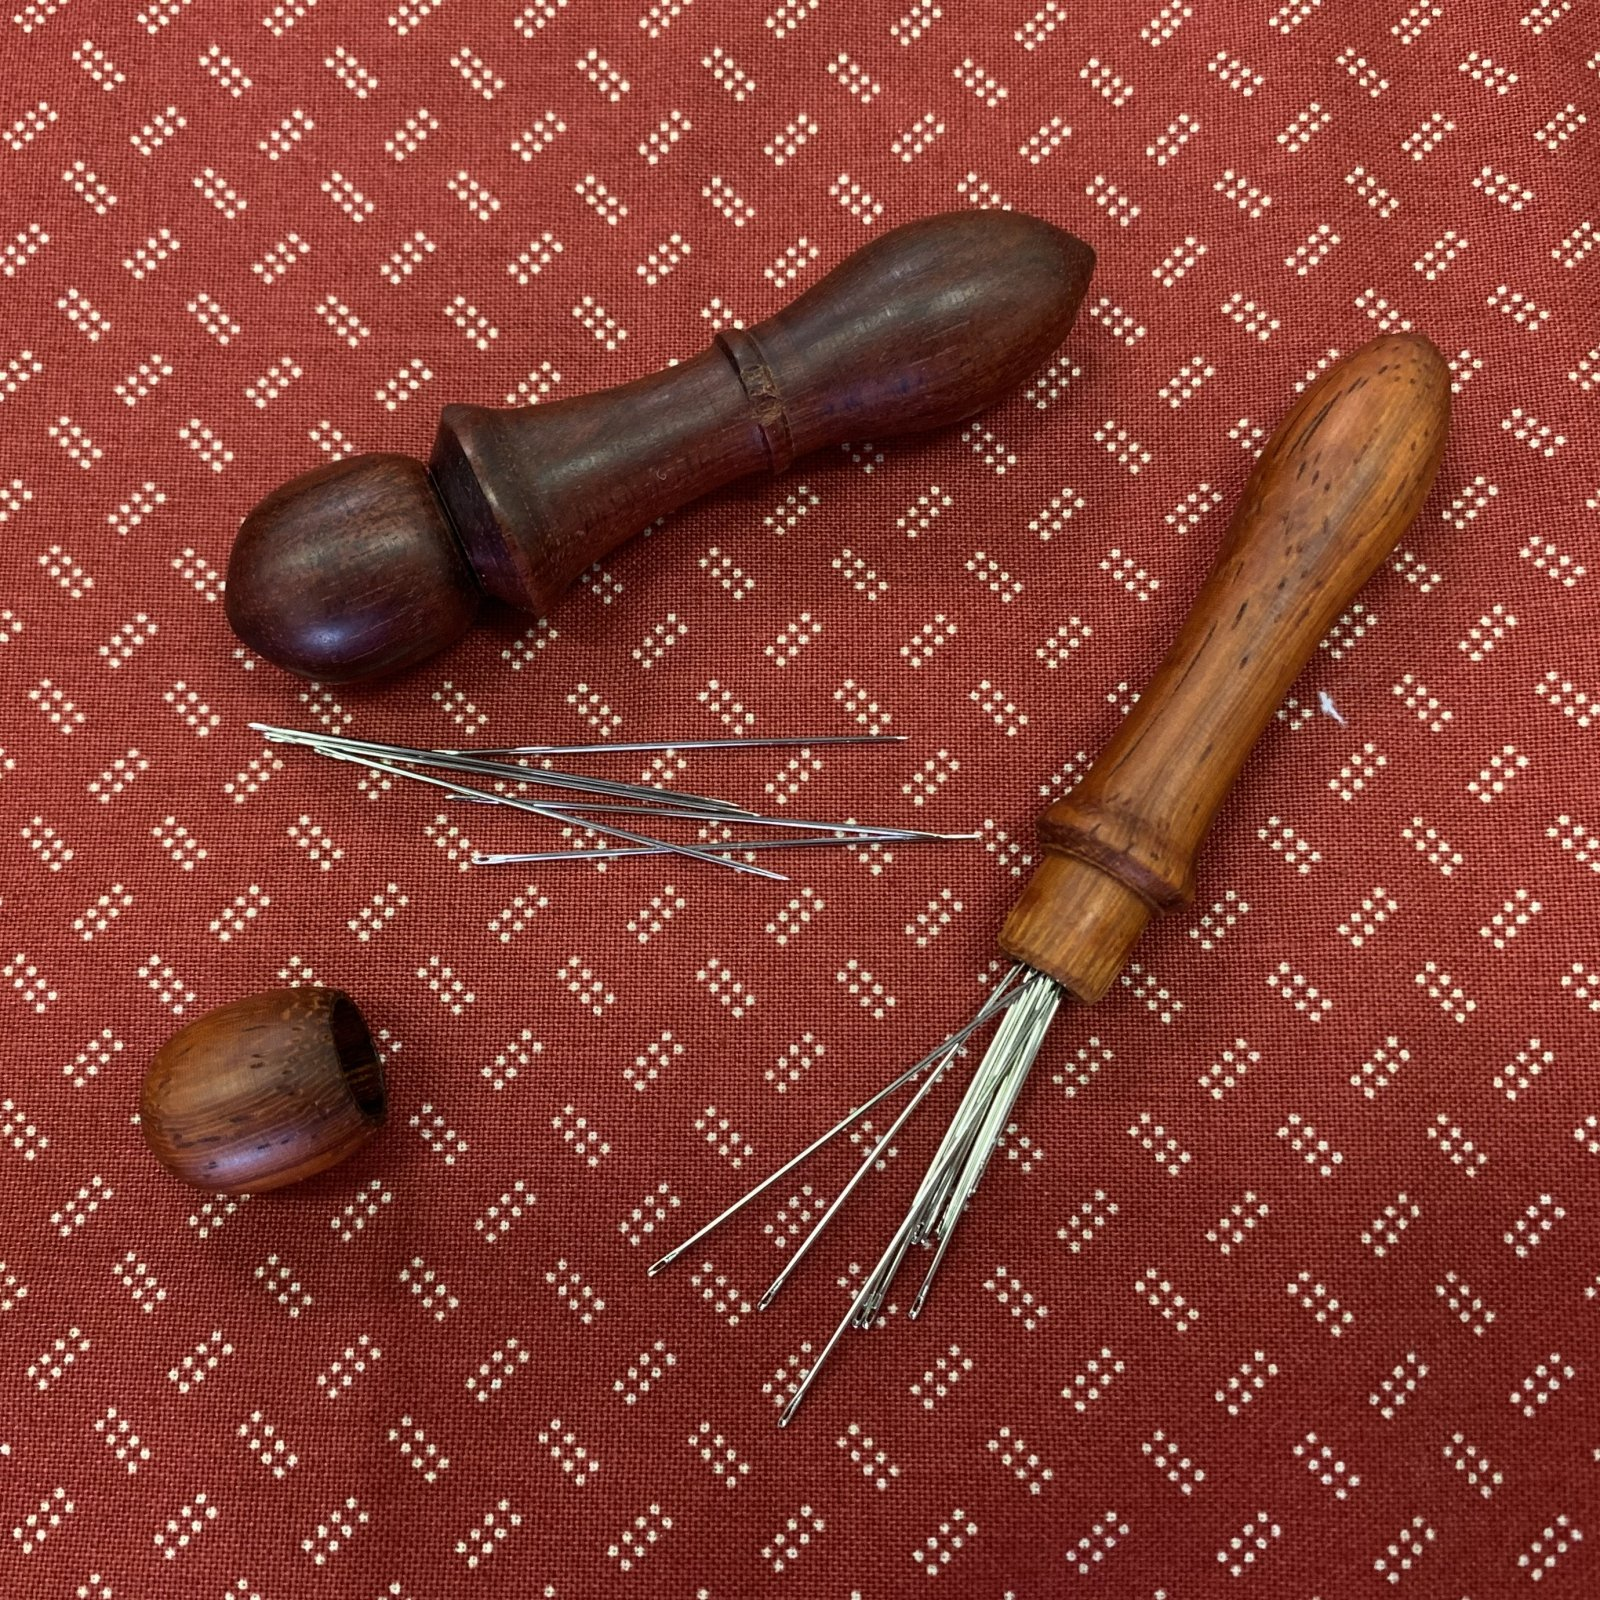 Wooden needle case